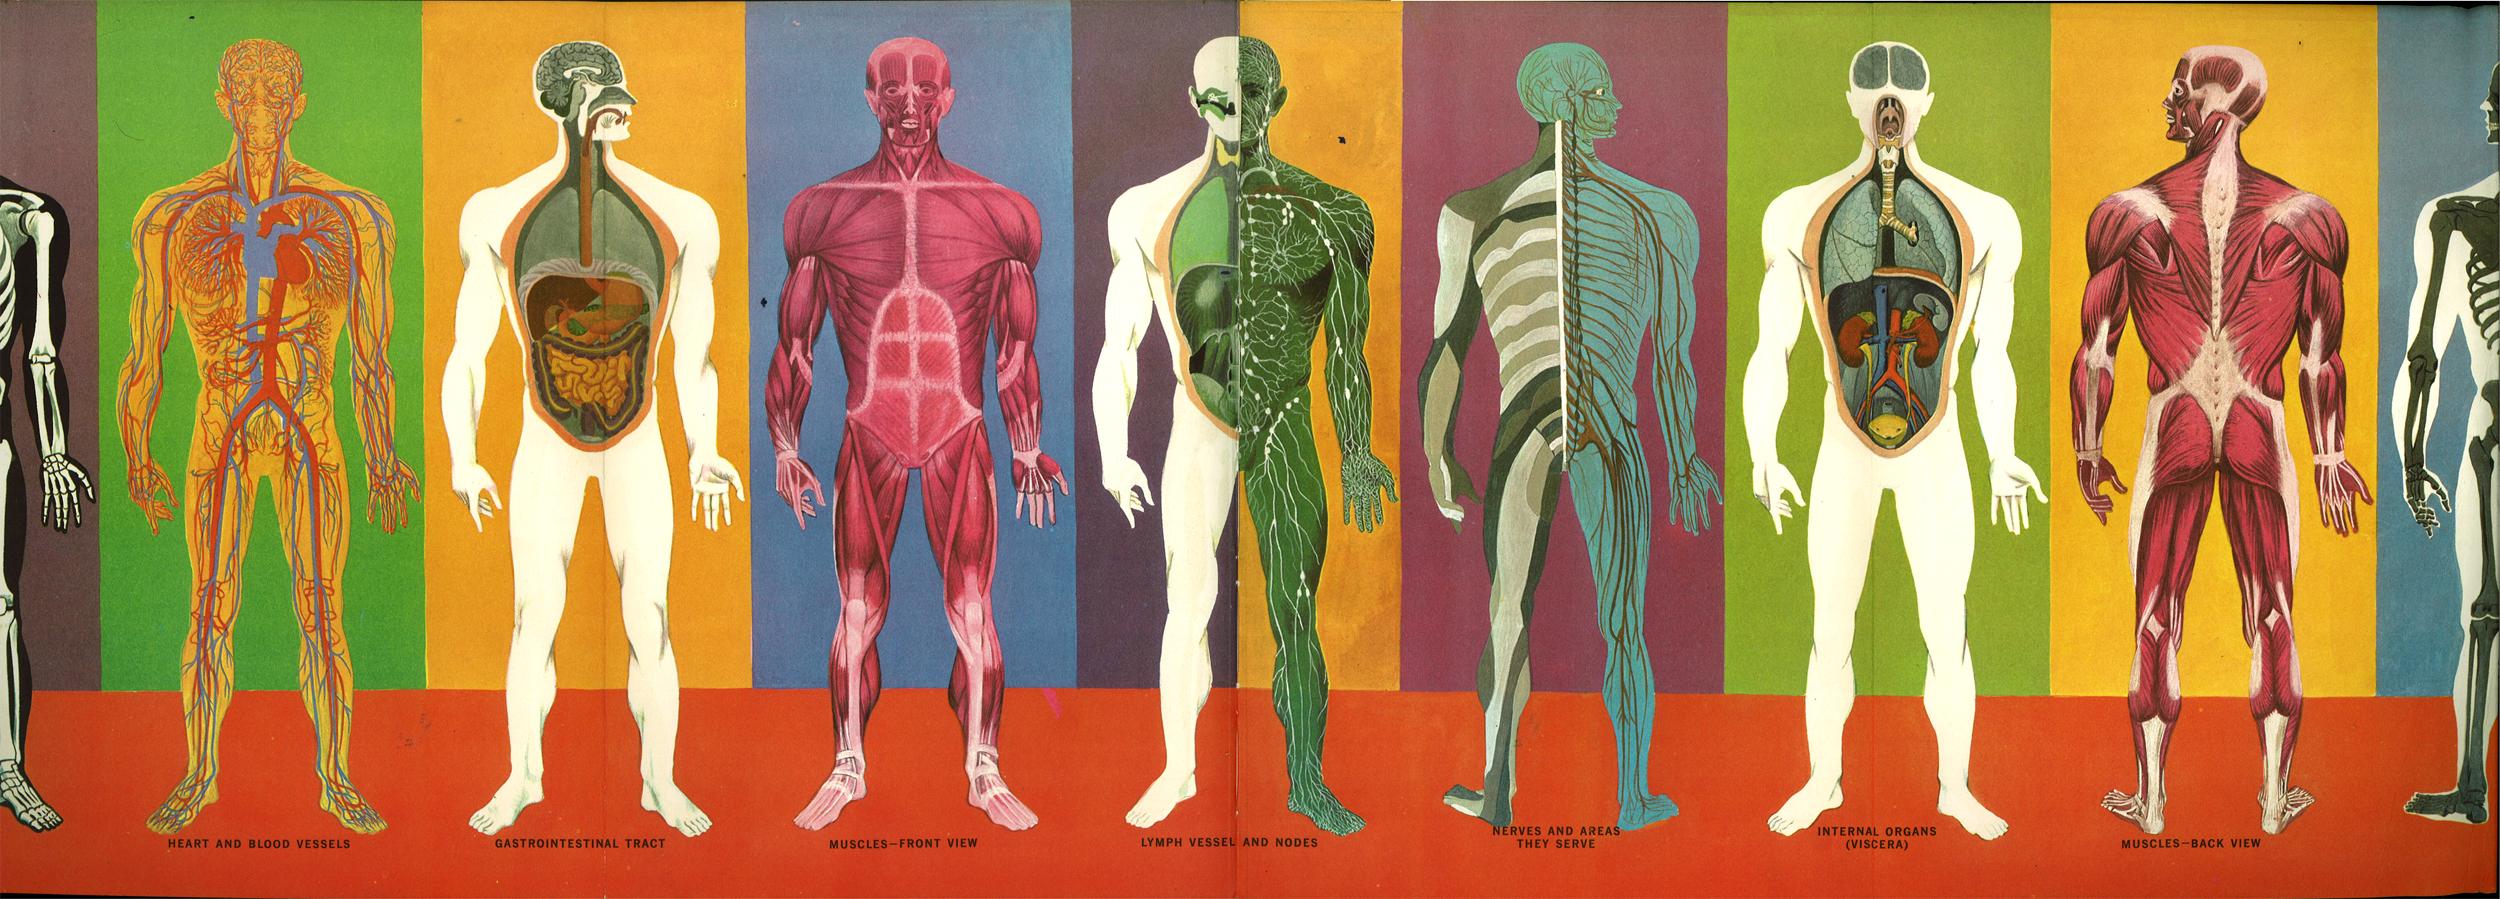 The Ward O Matic The Human Body